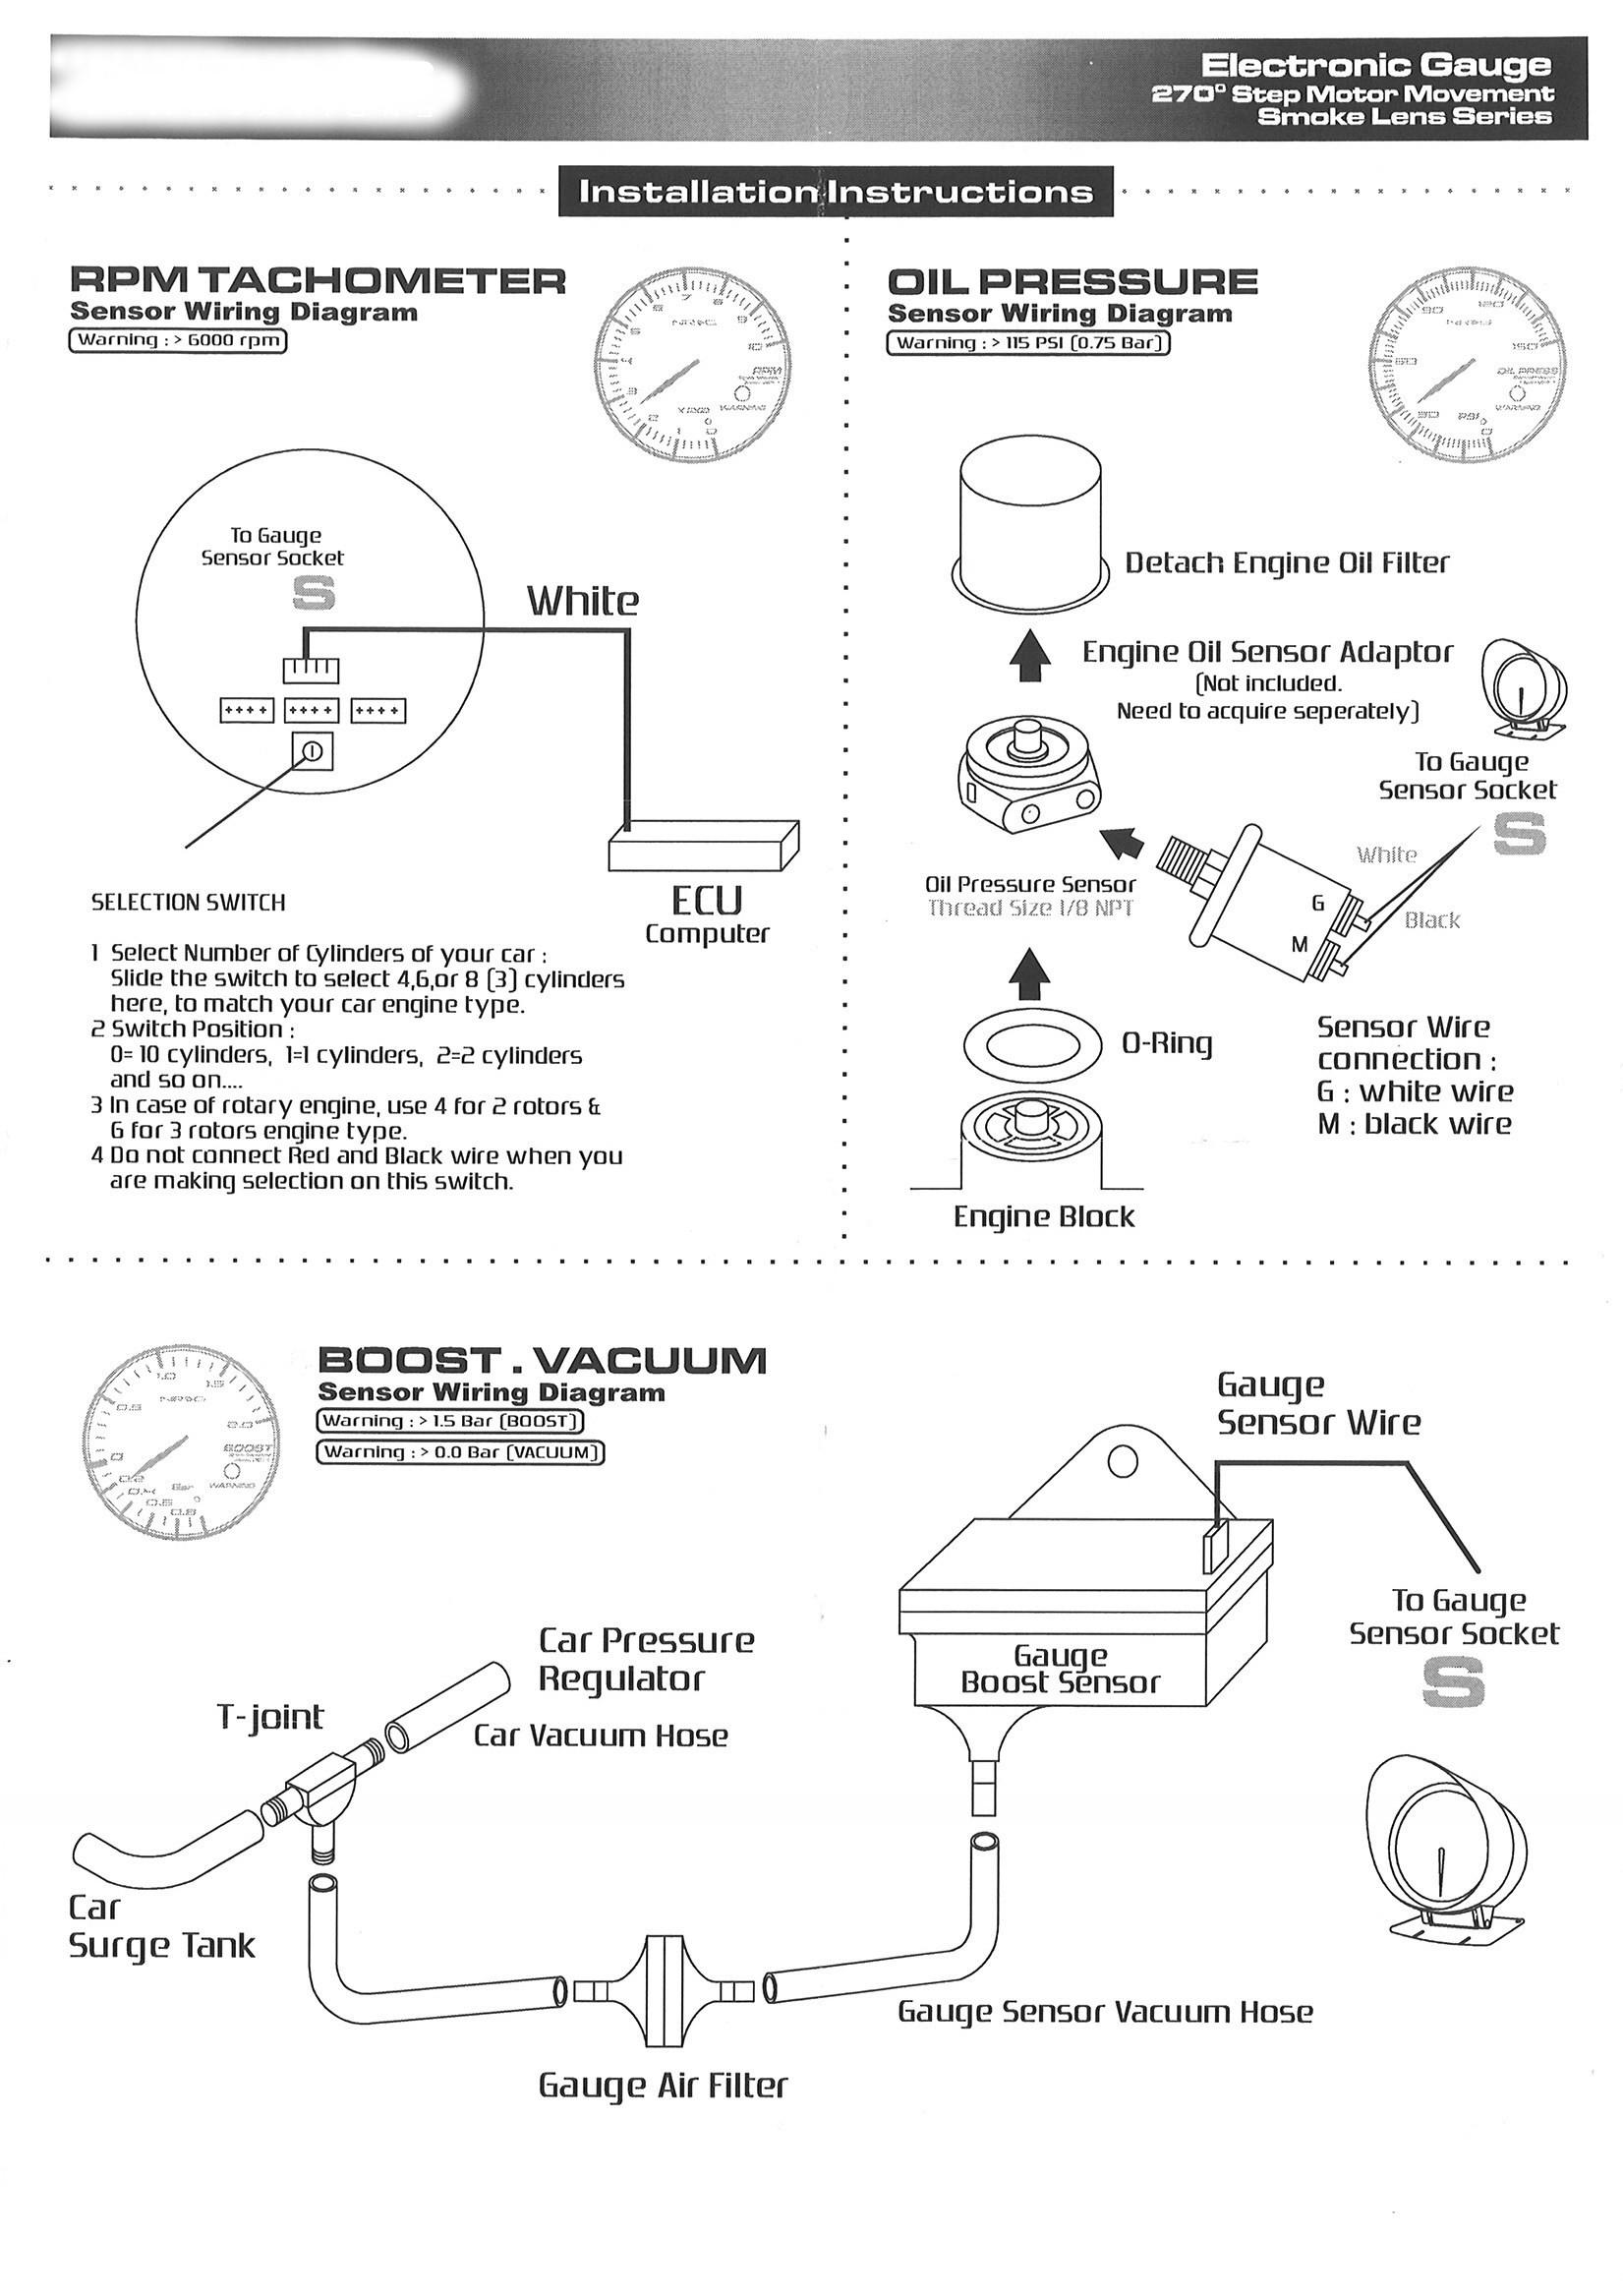 Wiring Diagrams For Aftermarket Gauges Tutorials Diy Faq Sau Diagram Post 5748 0 48590400 1313102112 Thumb